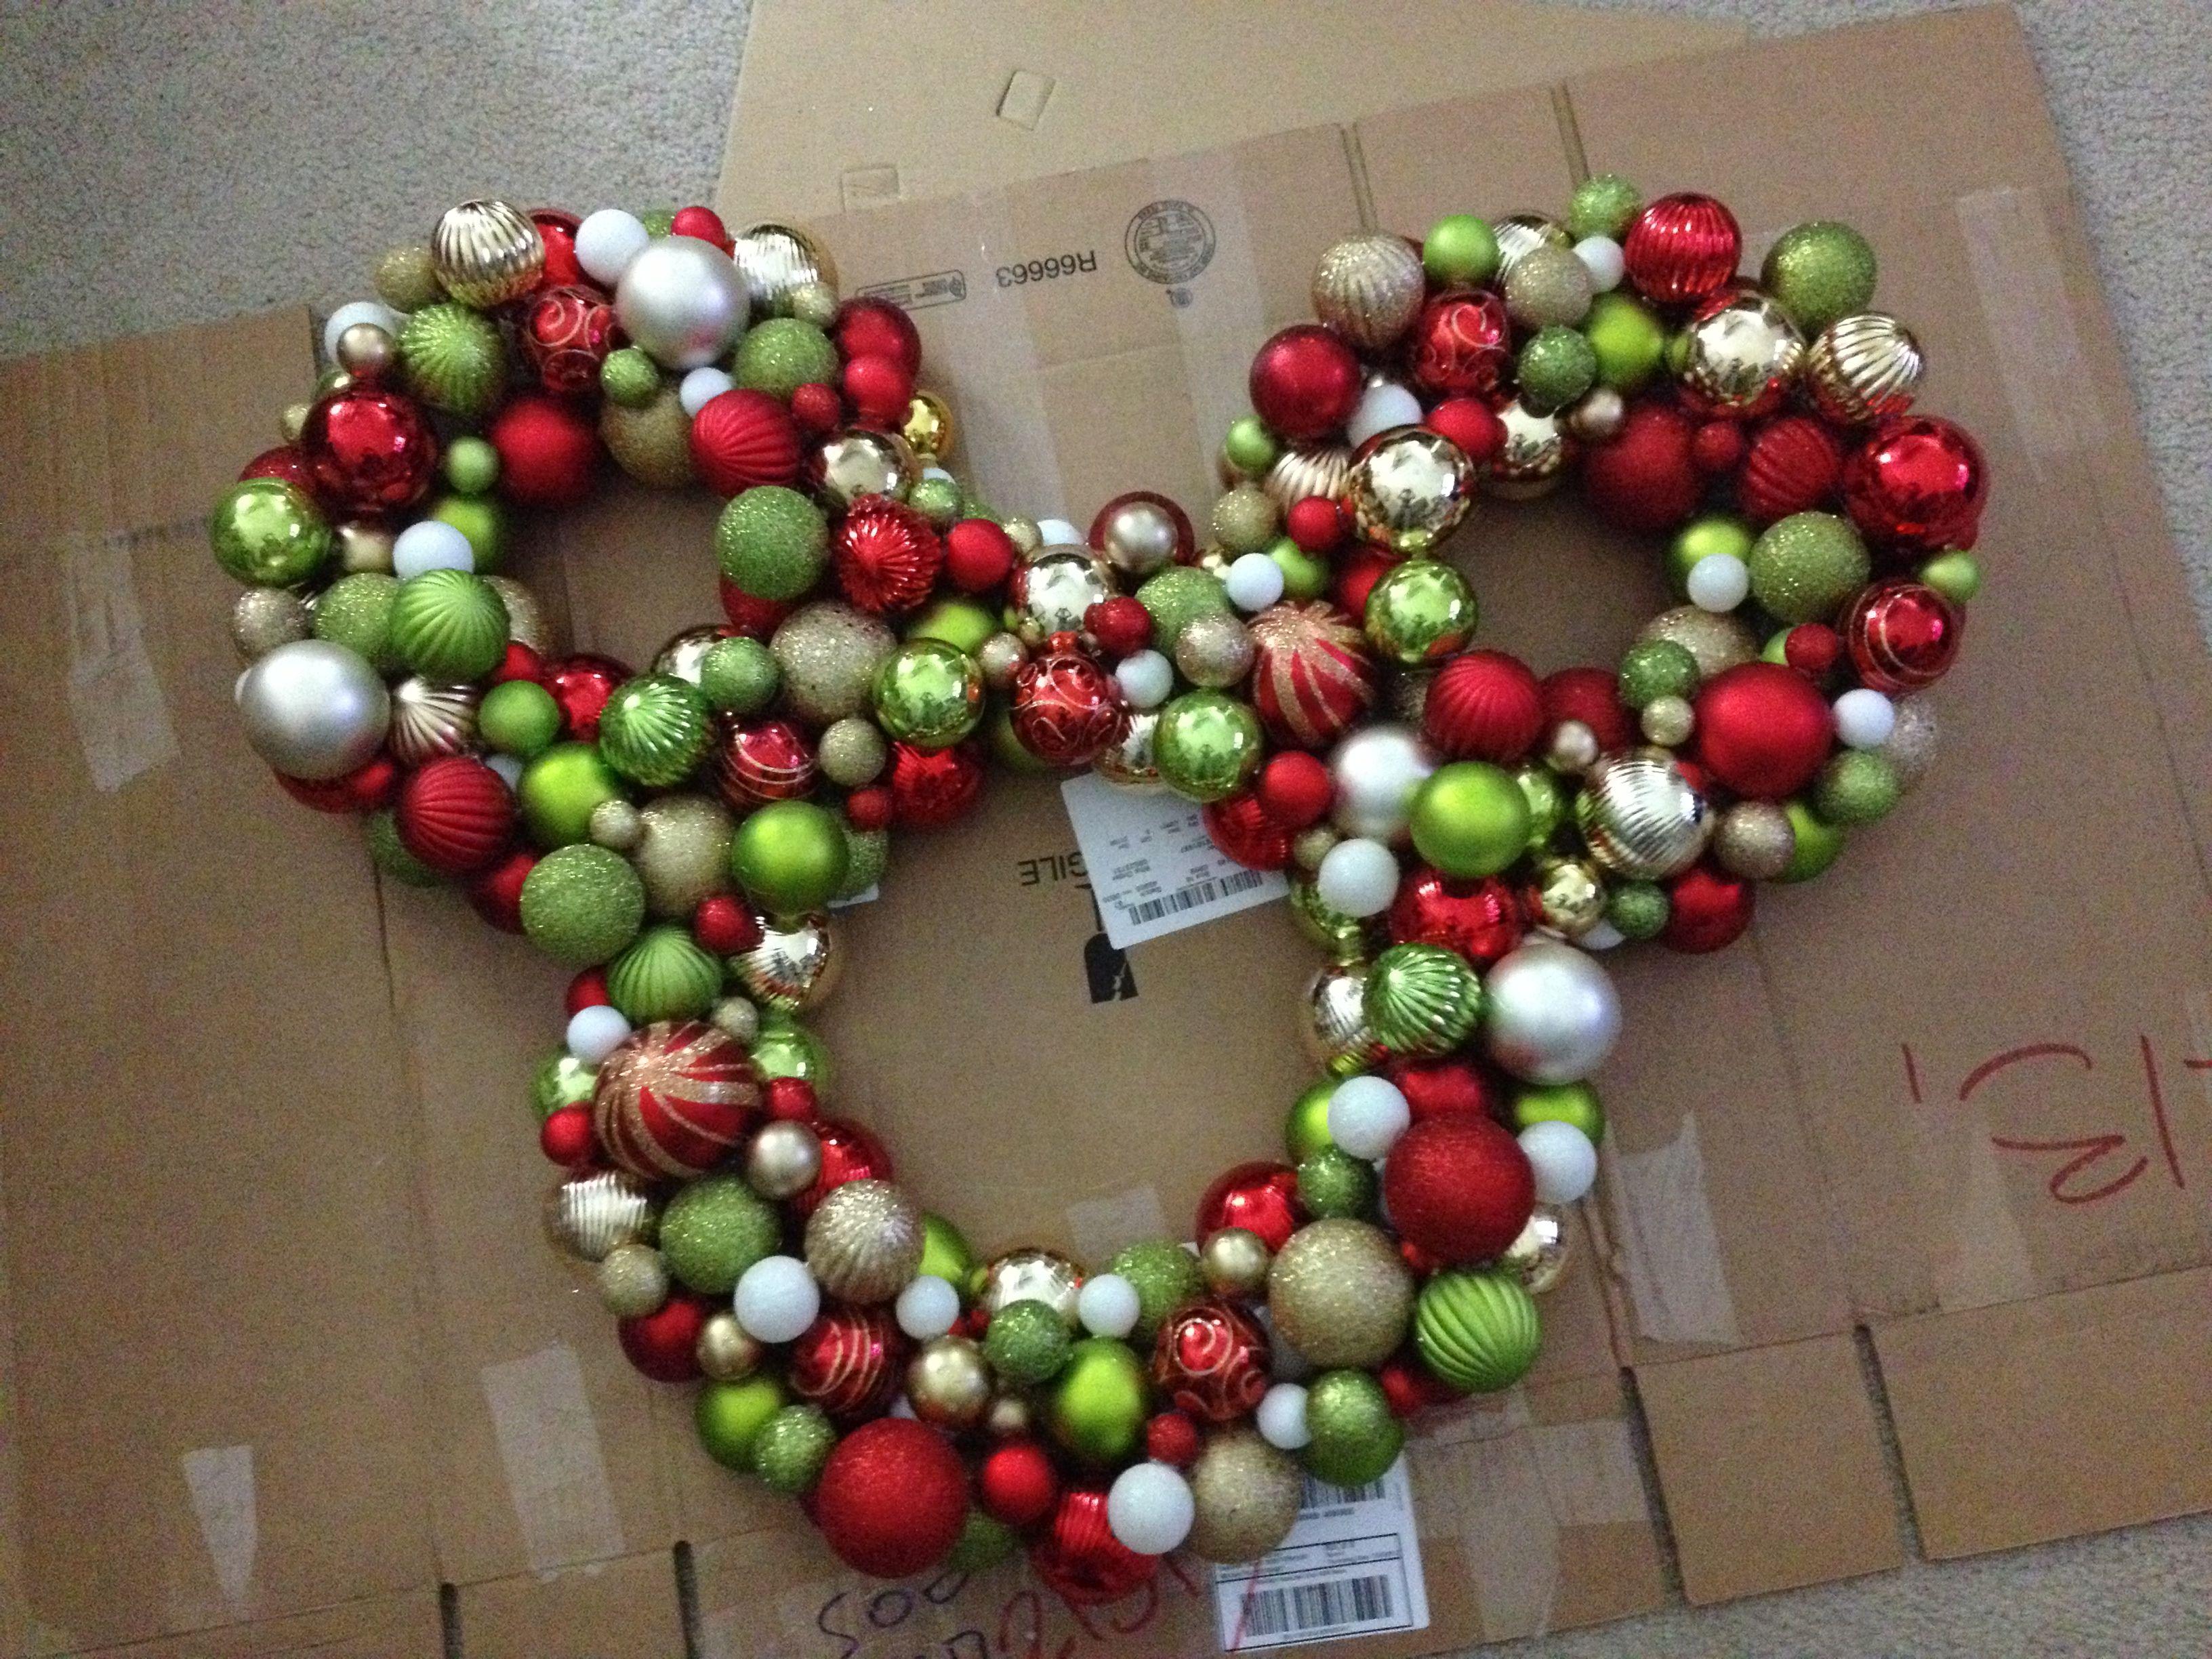 Pin By Carole Engler On Diy Disney Christmas Crafts Disney Christmas Decorations Christmas Wreaths